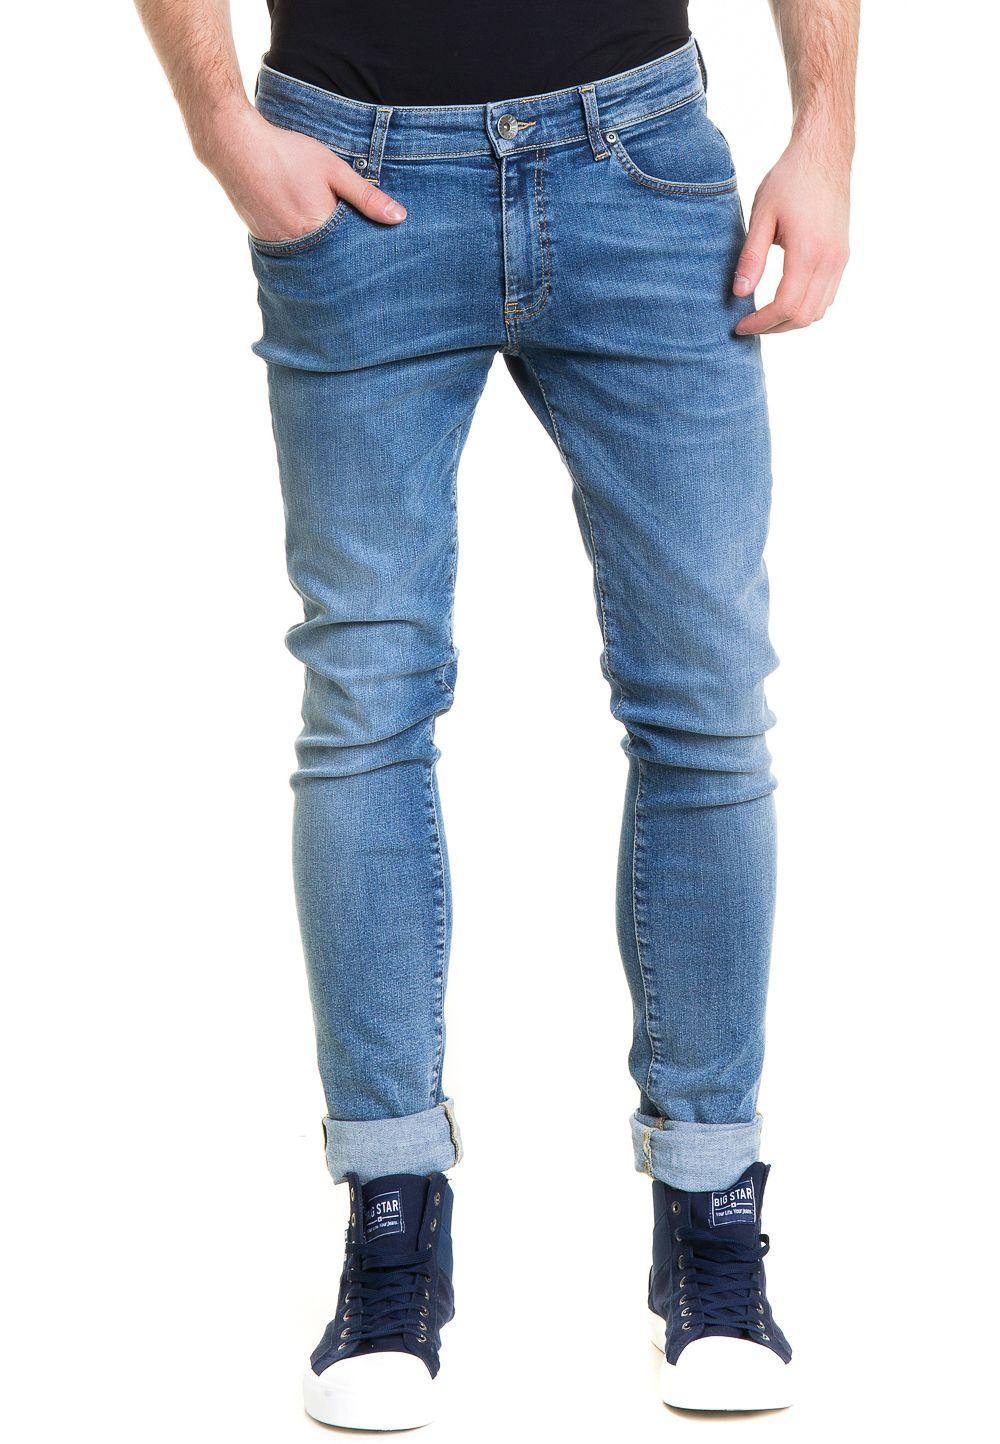 Big Star Jeans Trey Slim Fit Blau Jetzt Bestellen Unter Https Mode Ladendirekt De Herren Bekleidung Jeans Sonstige Jeans U Big Star Jeans Jeans Bekleidung